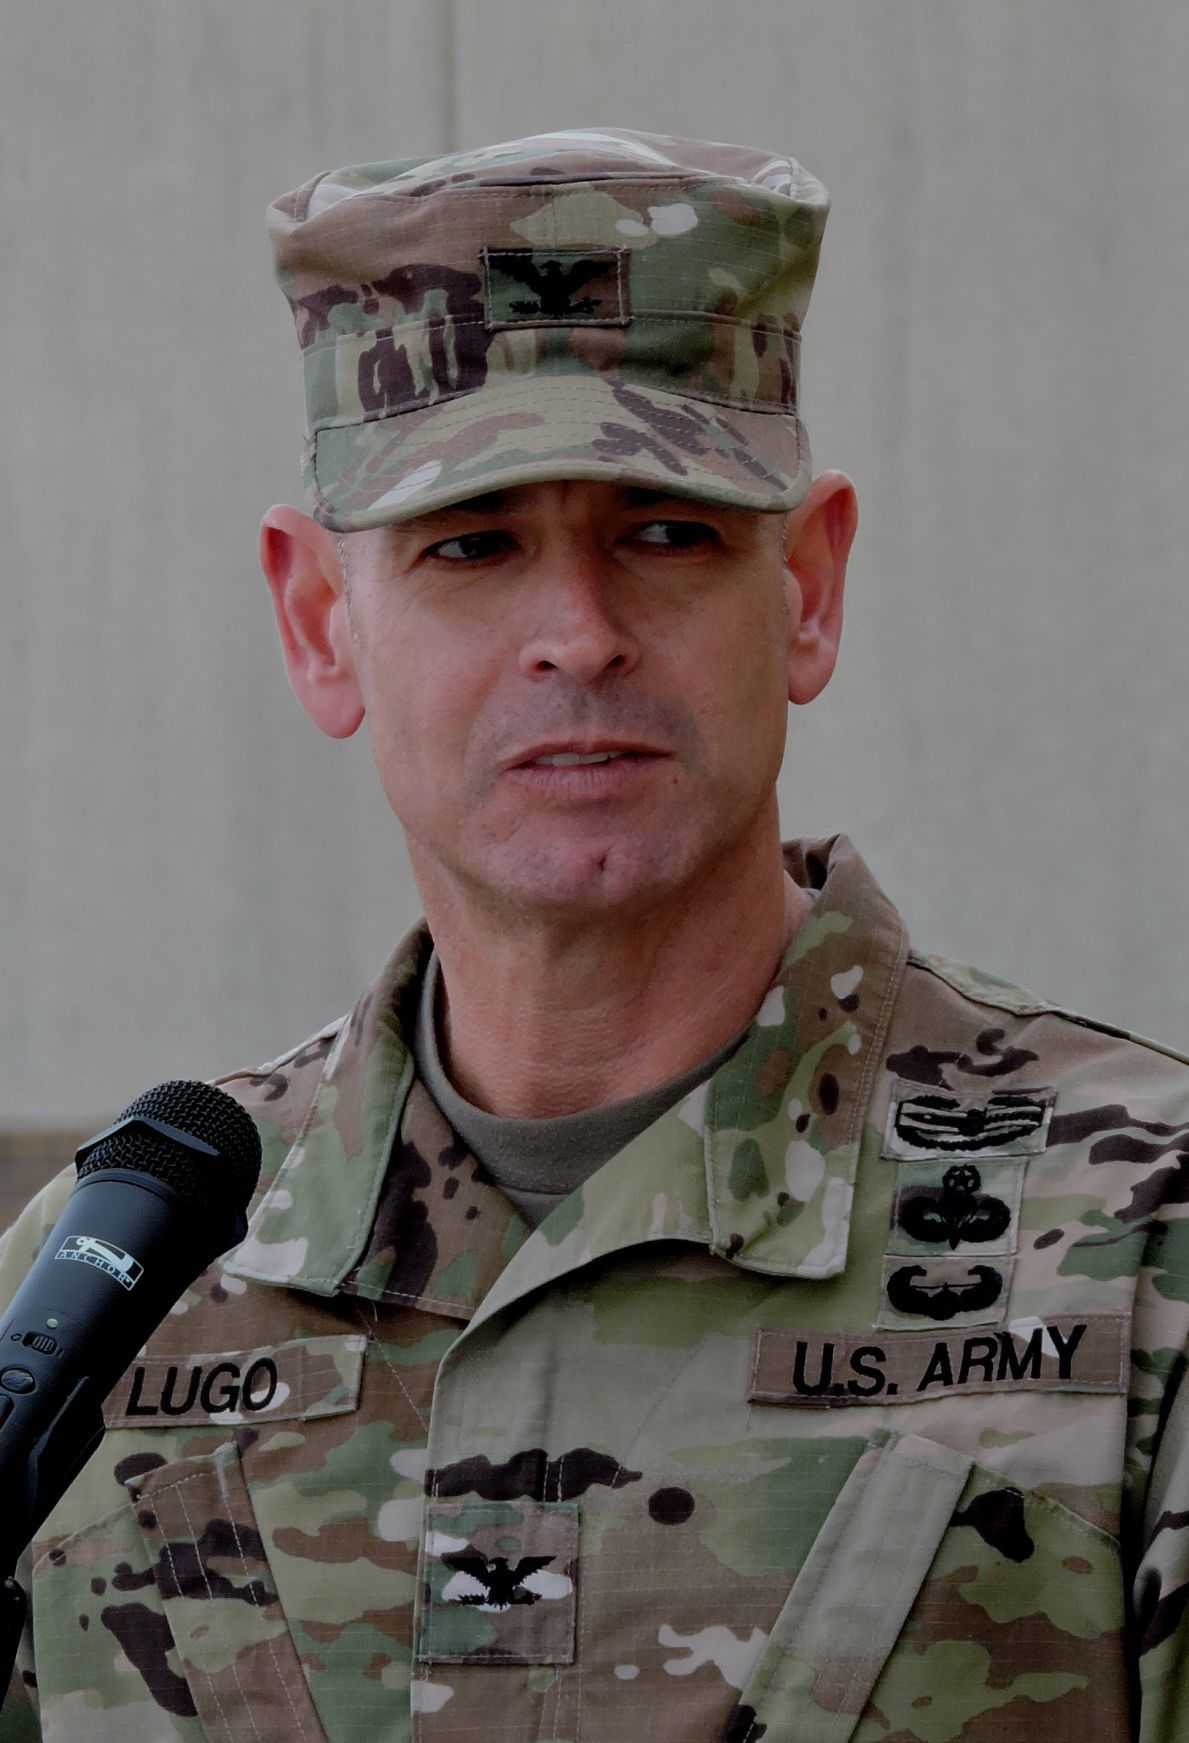 Col. Anthony Lugo